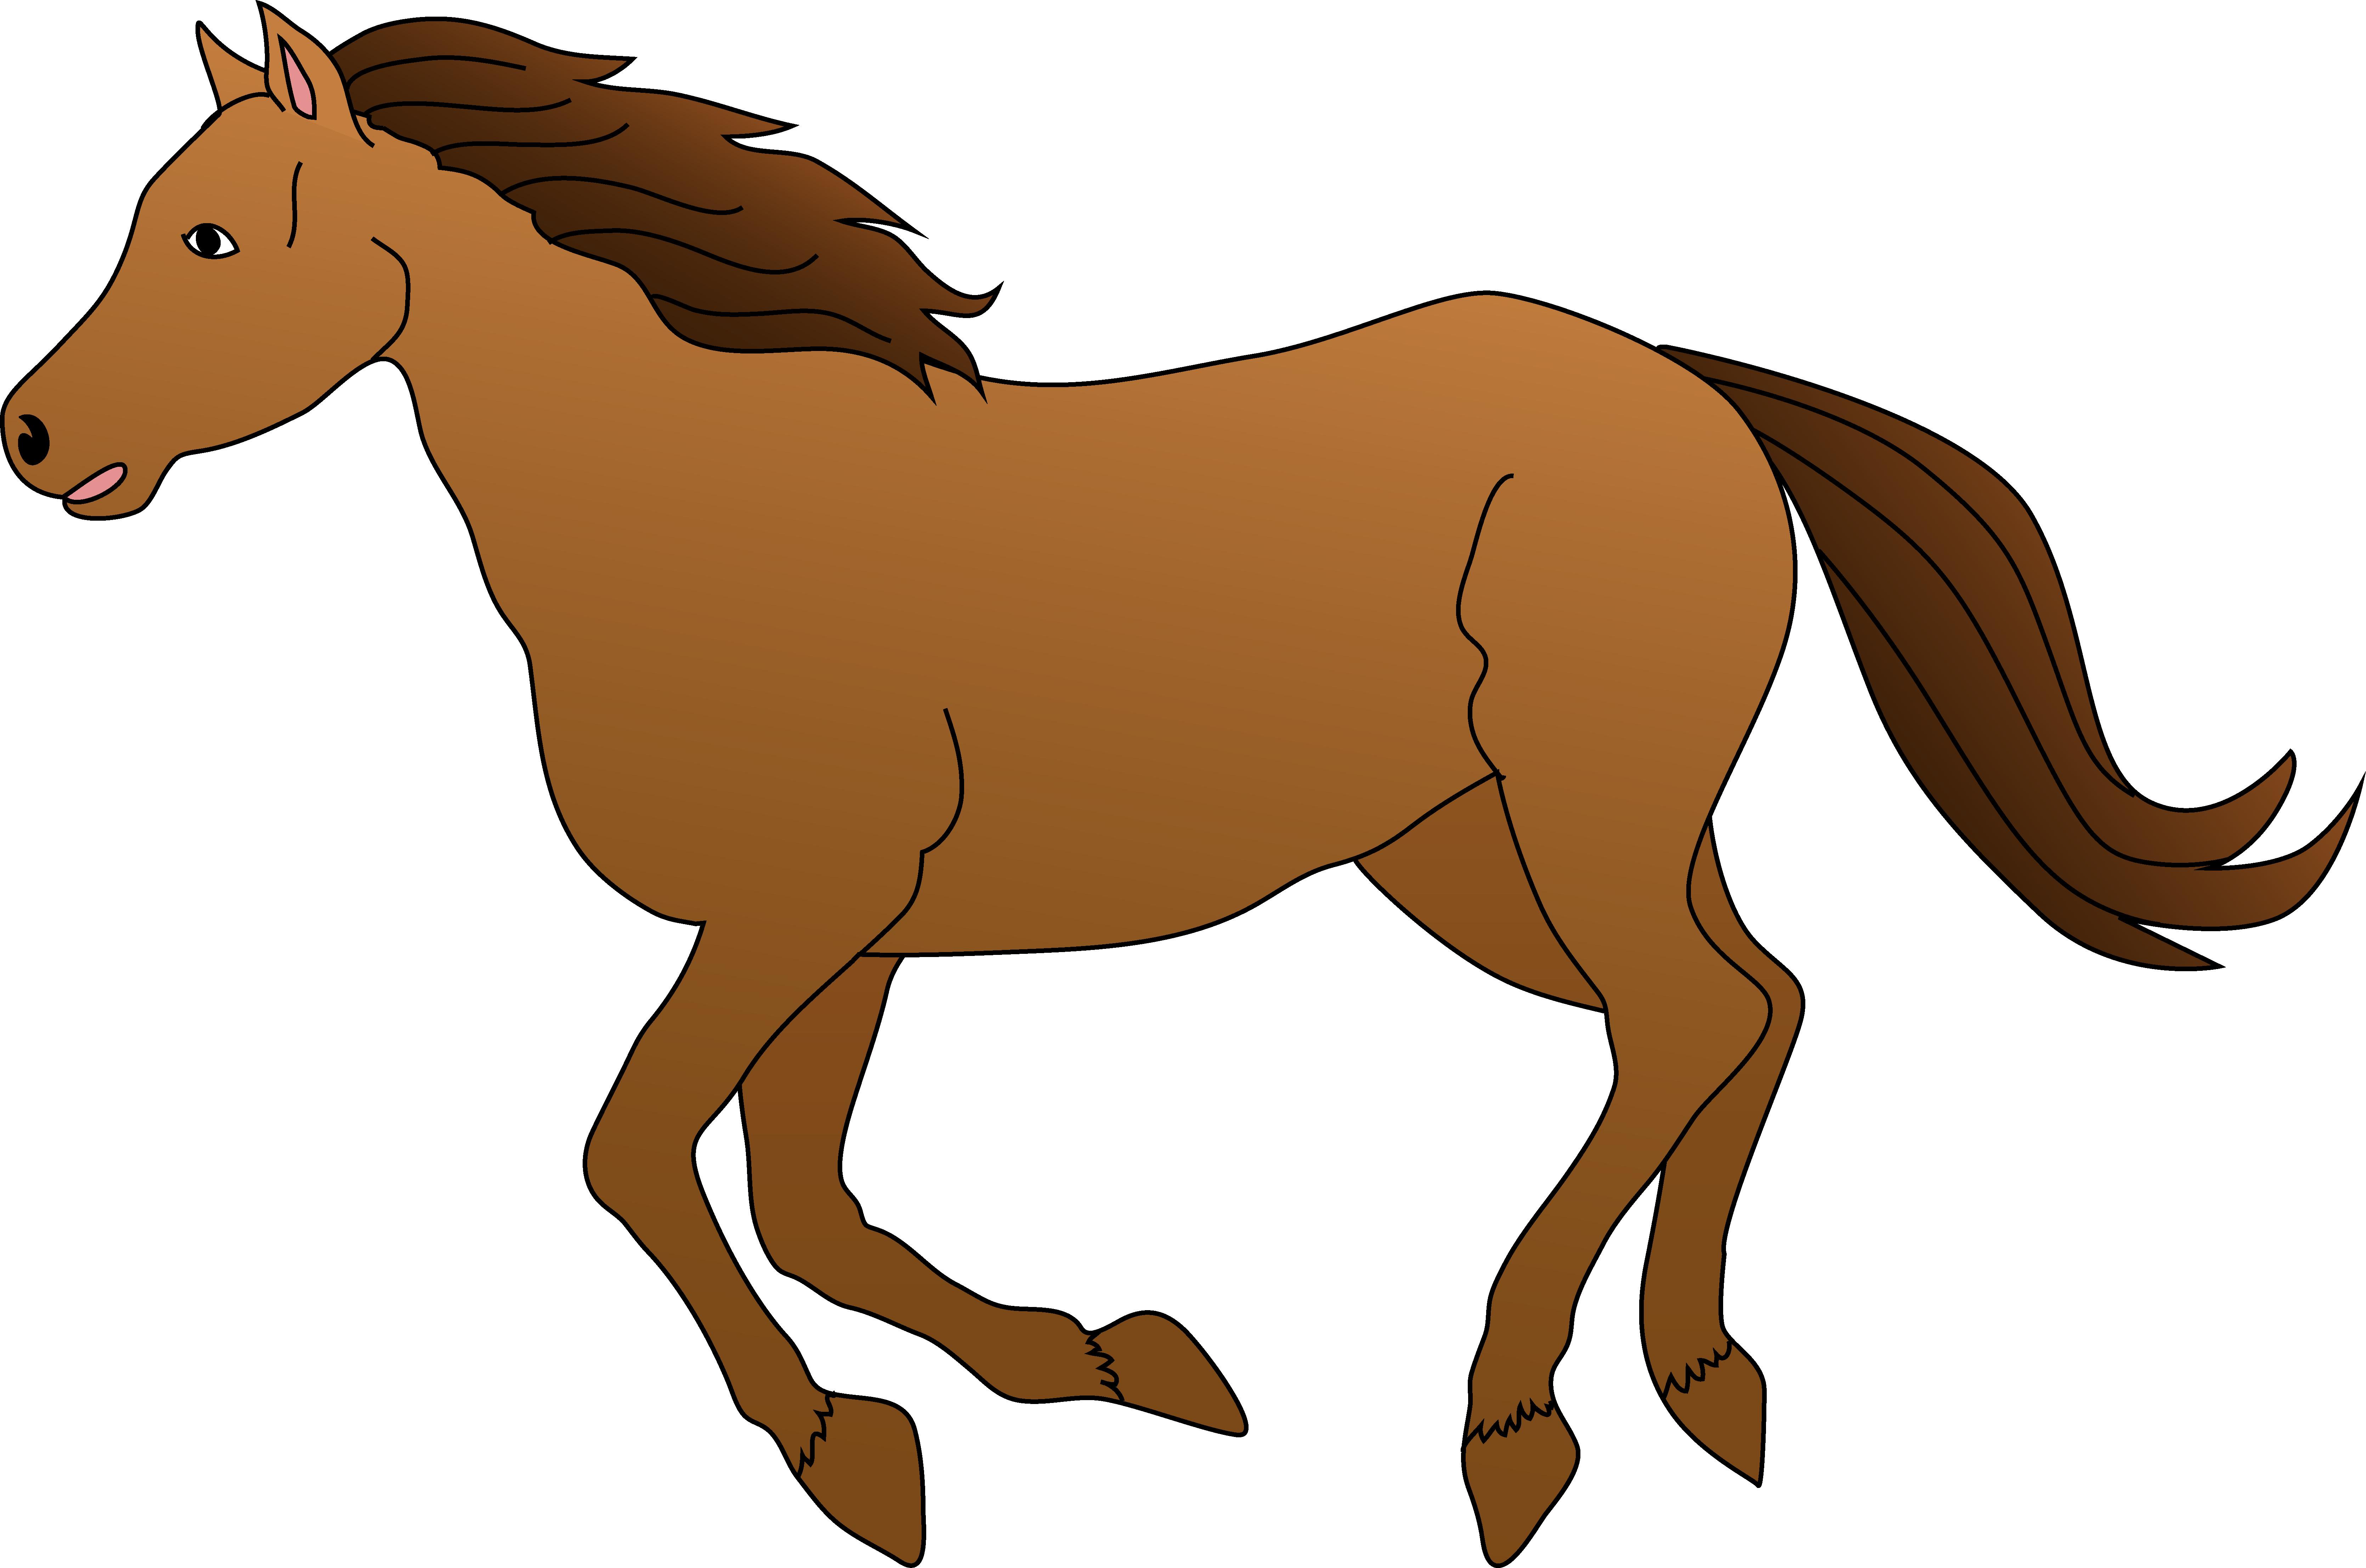 6680x4427 Free Clip Art Horse Running Horse Silhouette Clipart Best Clipart